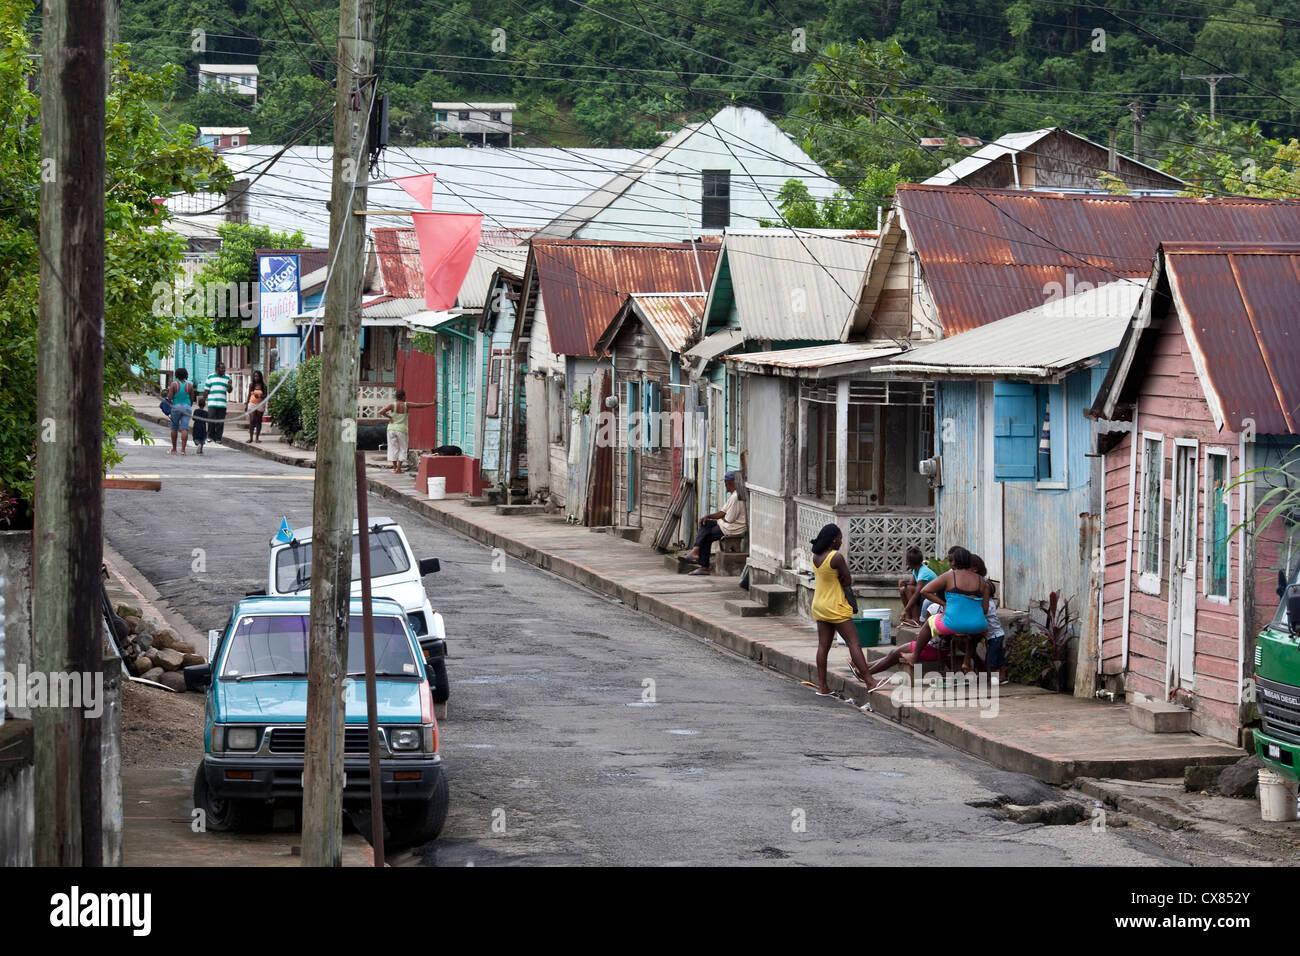 shacks in Anse-la-Rey, St Lucia, Caribbean - Stock Image